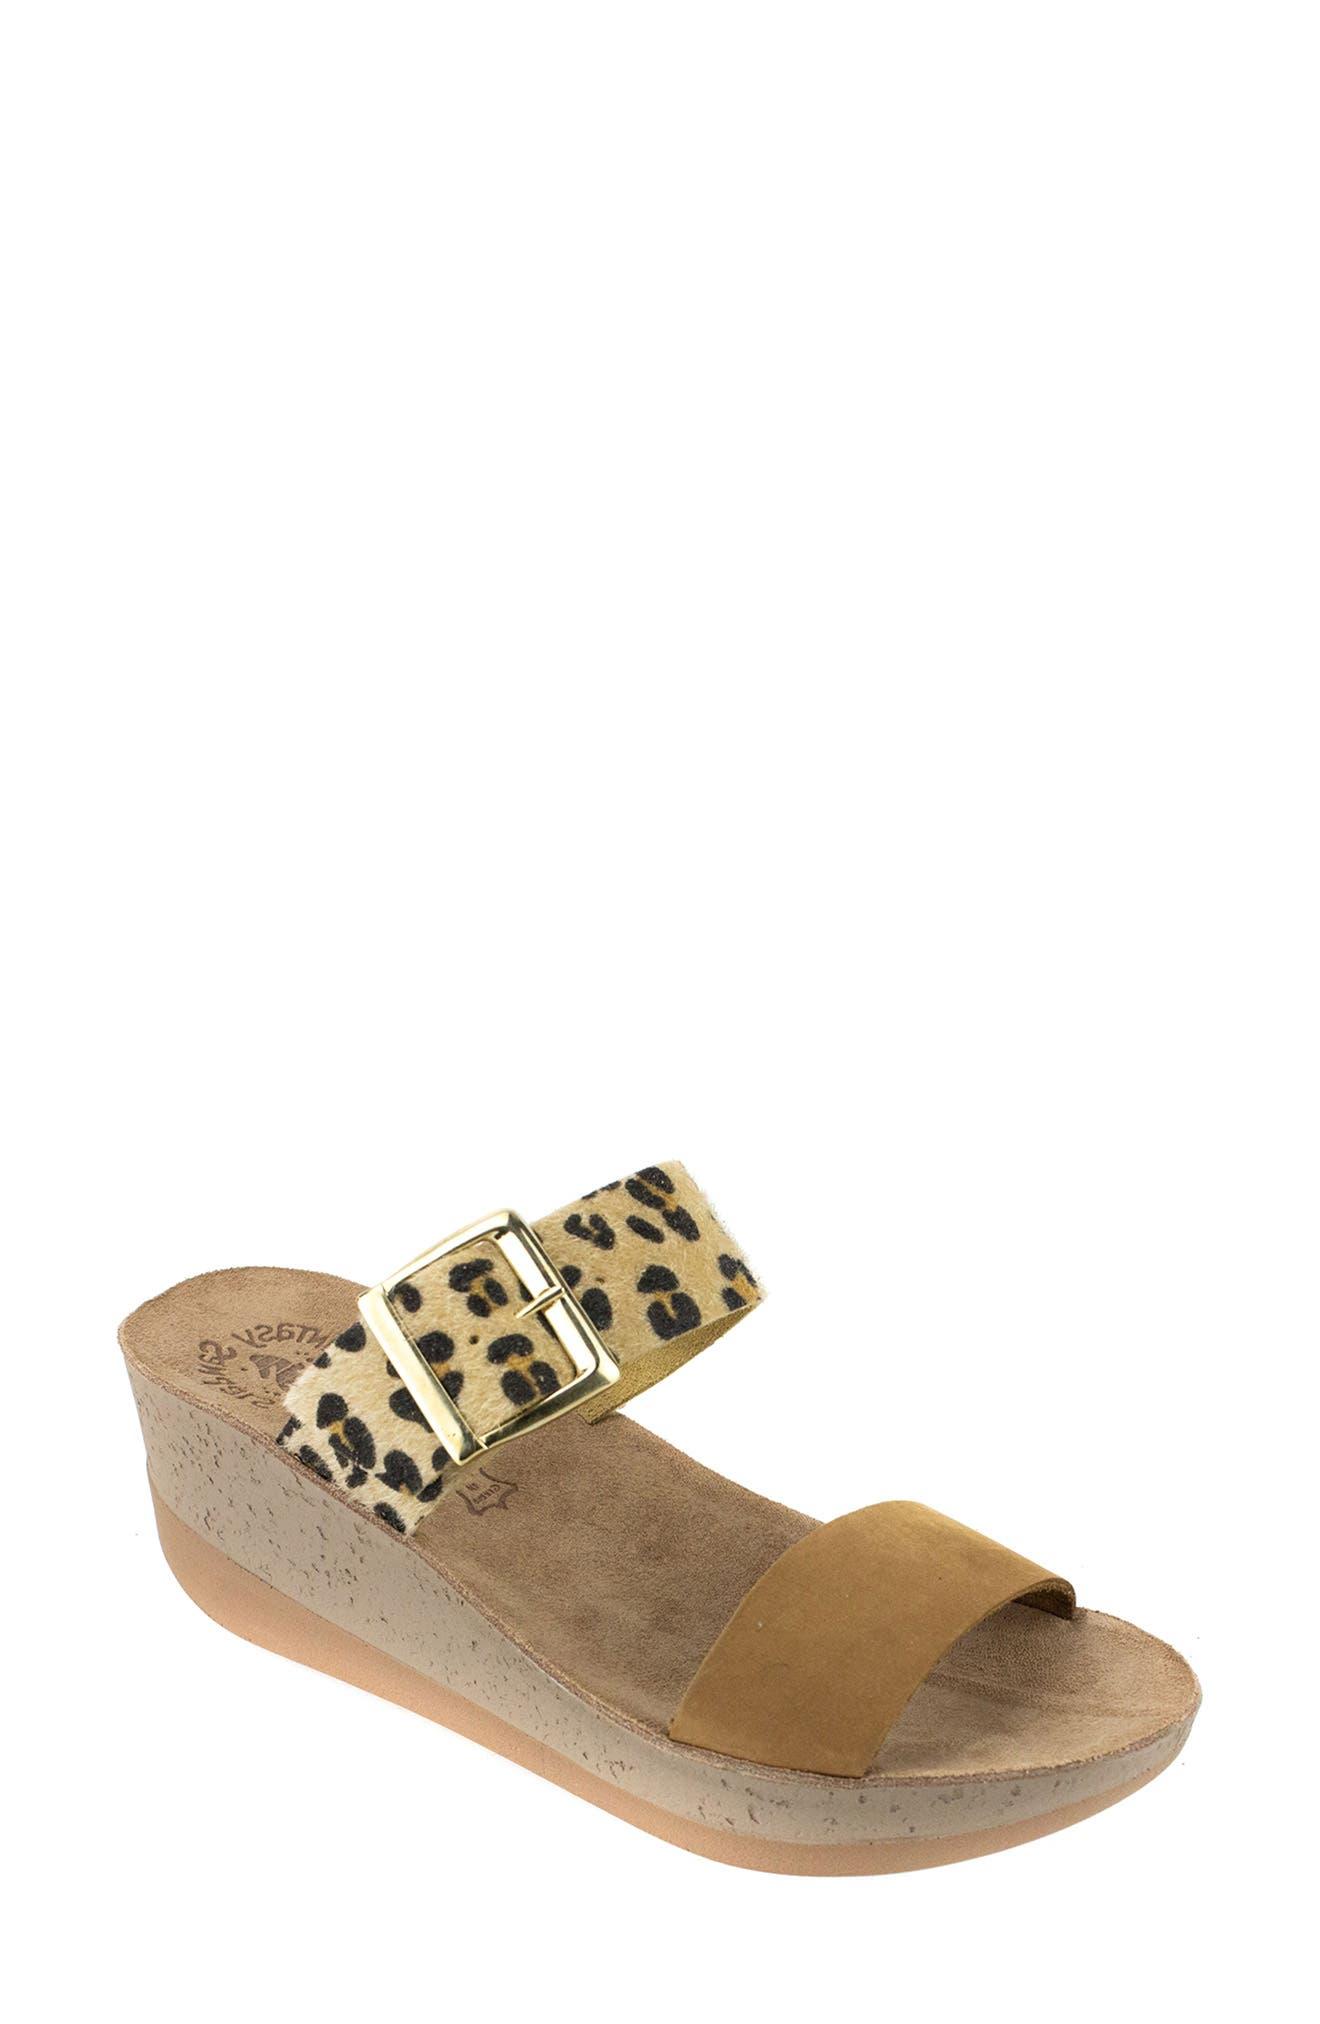 Artemis Wedge Slide Sandal